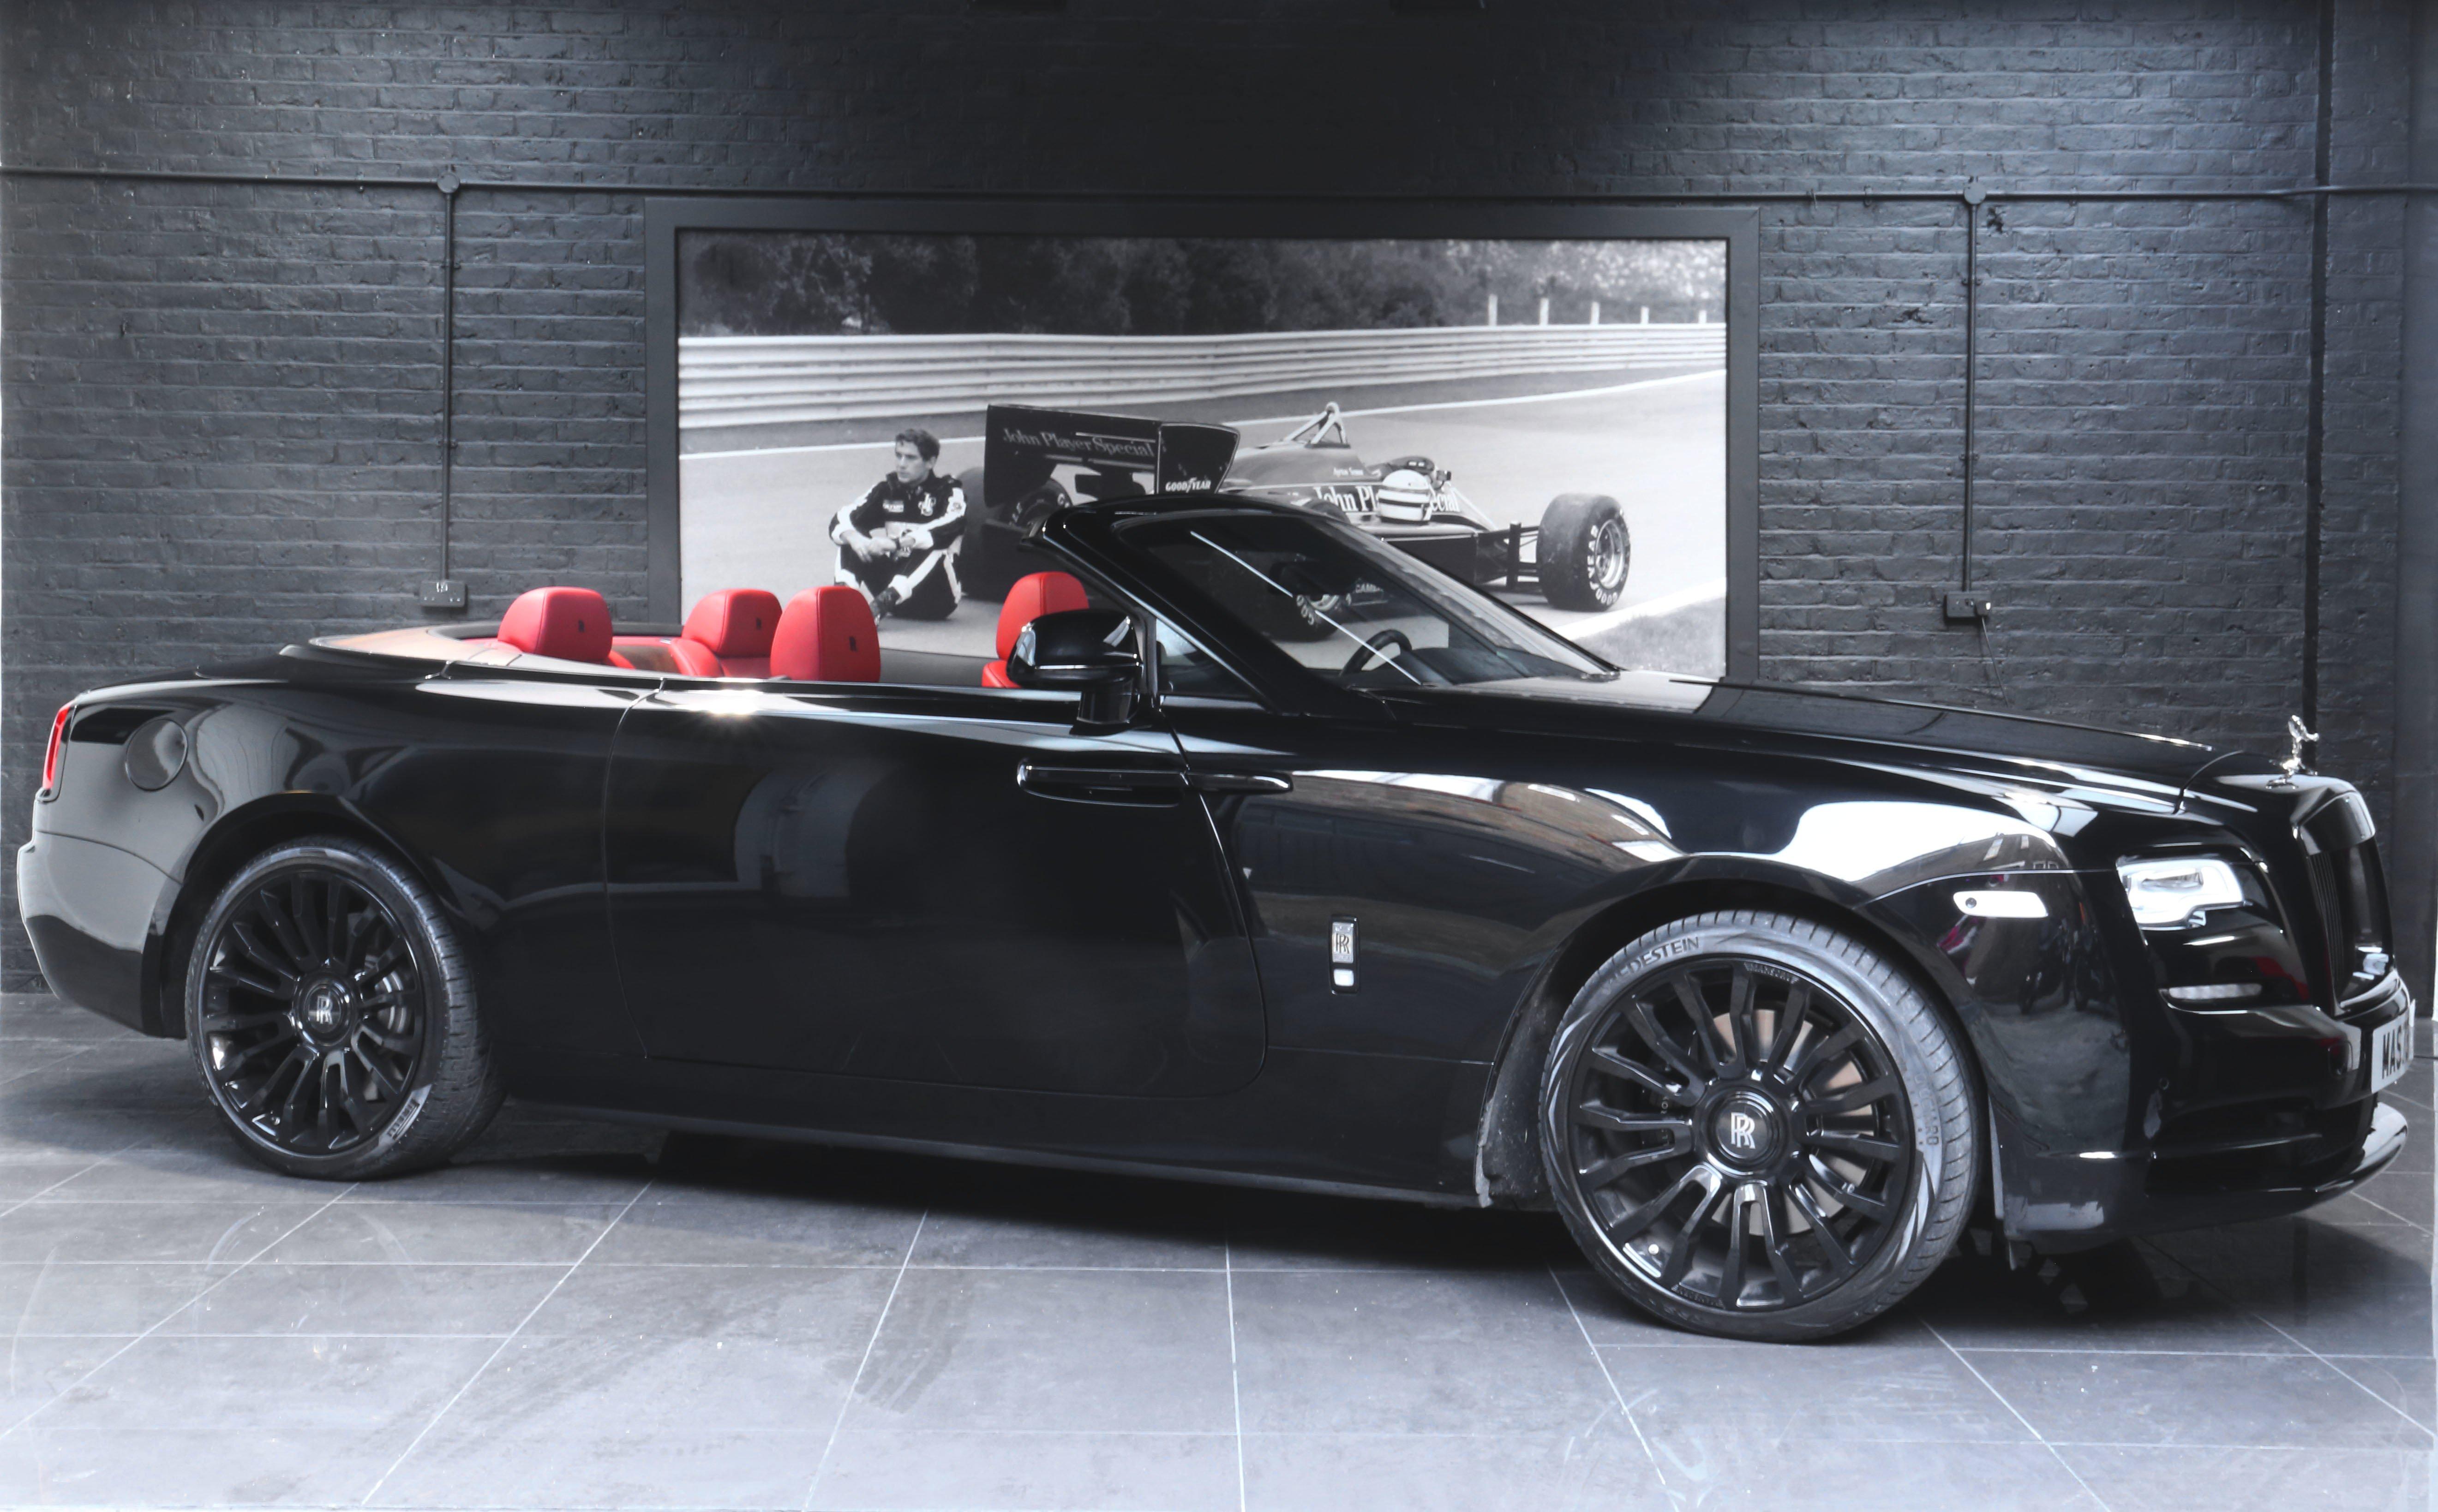 Lhd Rolls Royce Dawn Pegasus Auto House